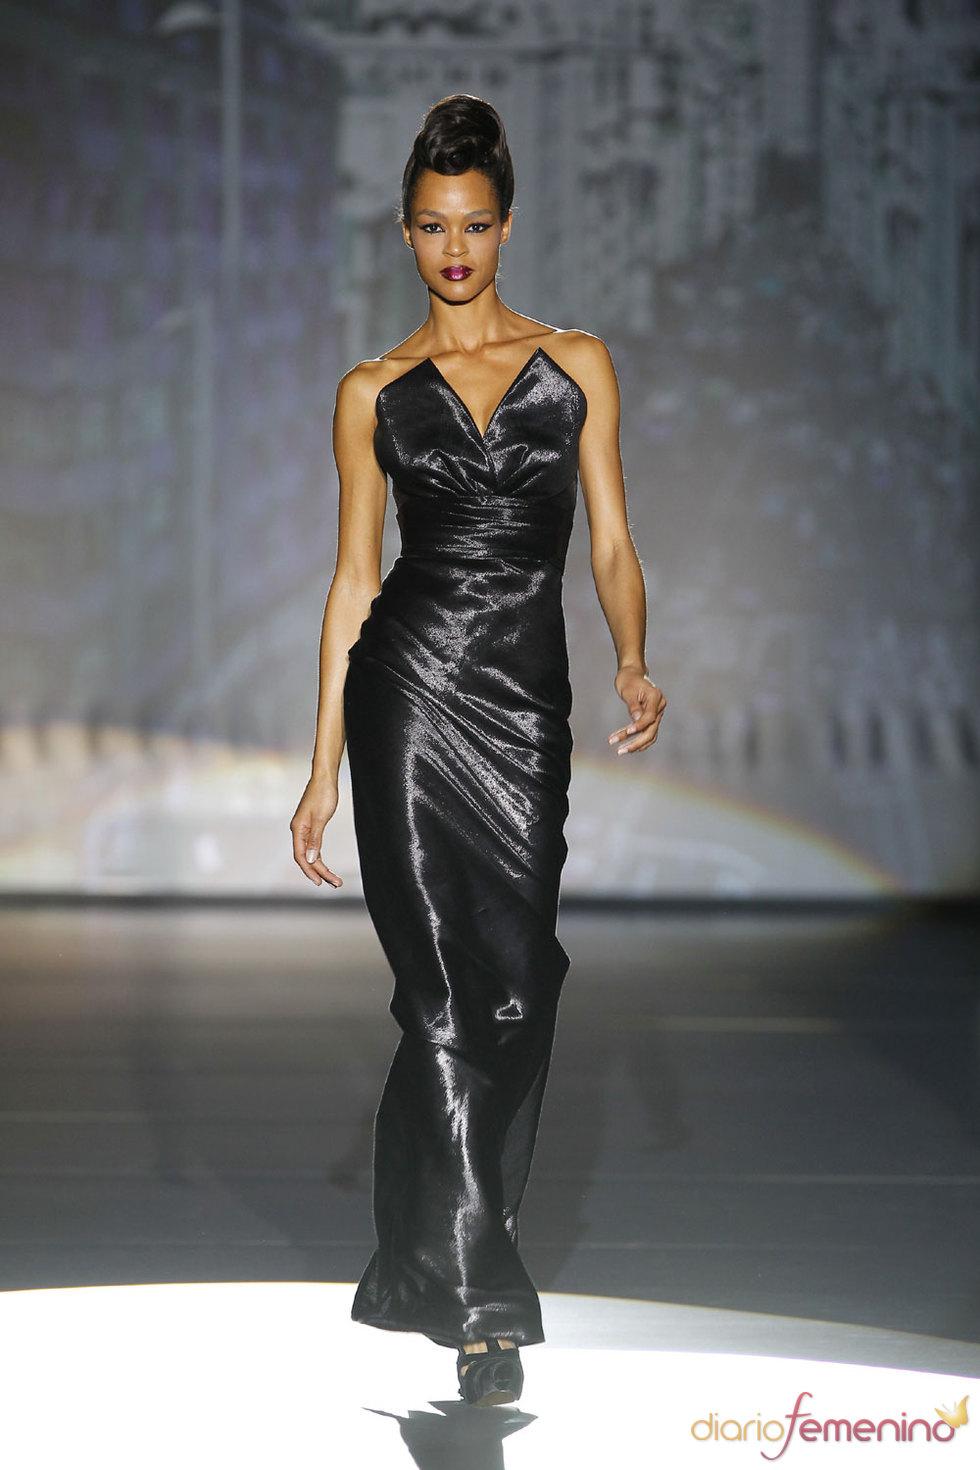 Cibeles Fashion Week 2010 - Hannibal Laguna